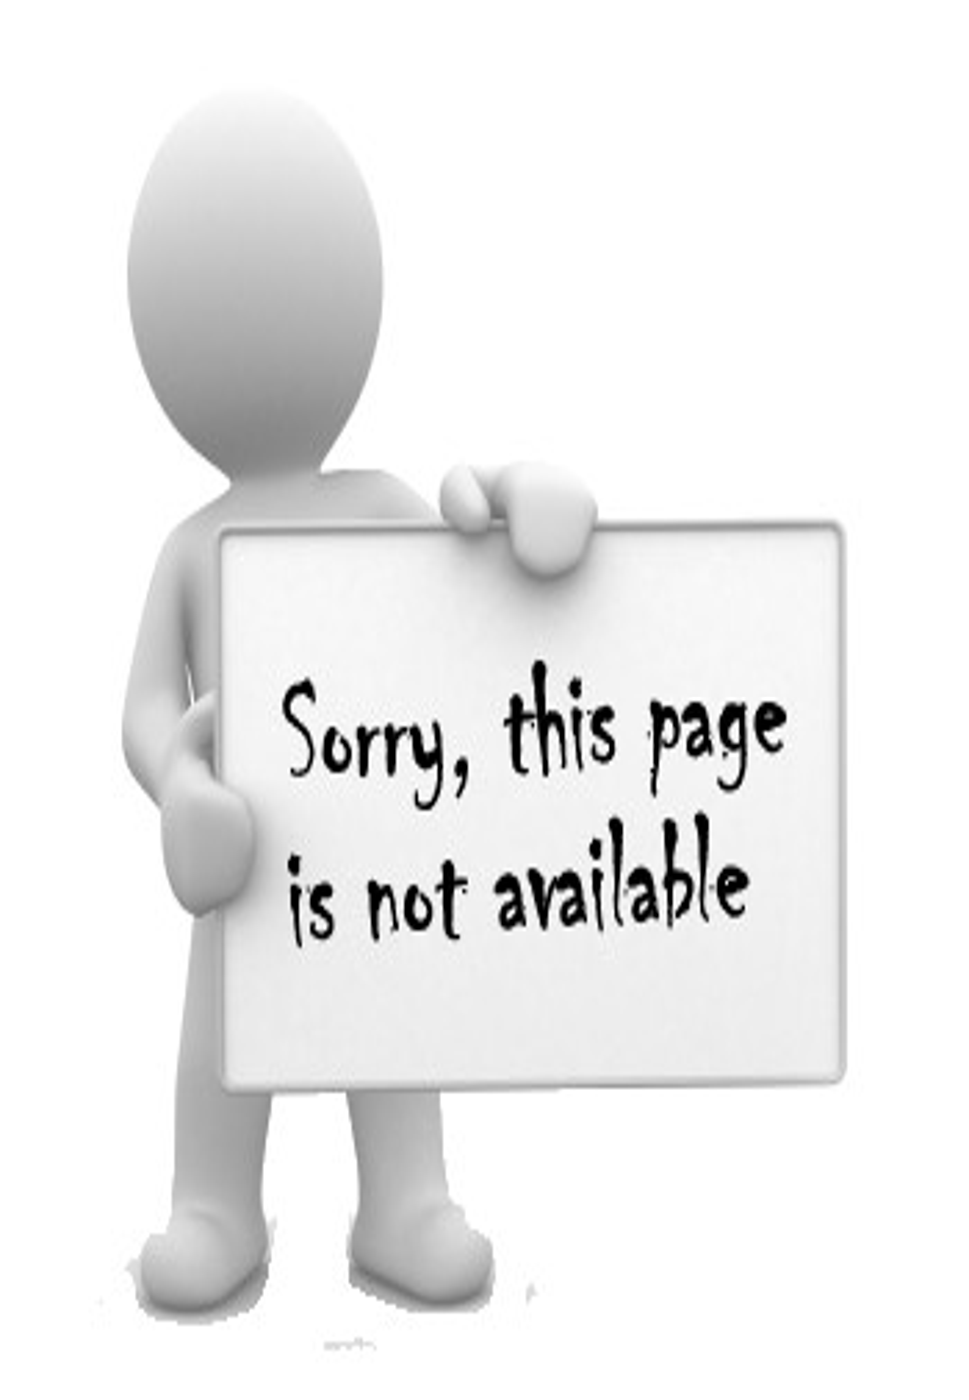 Youjo Senki - Chapter 43 - Page 2